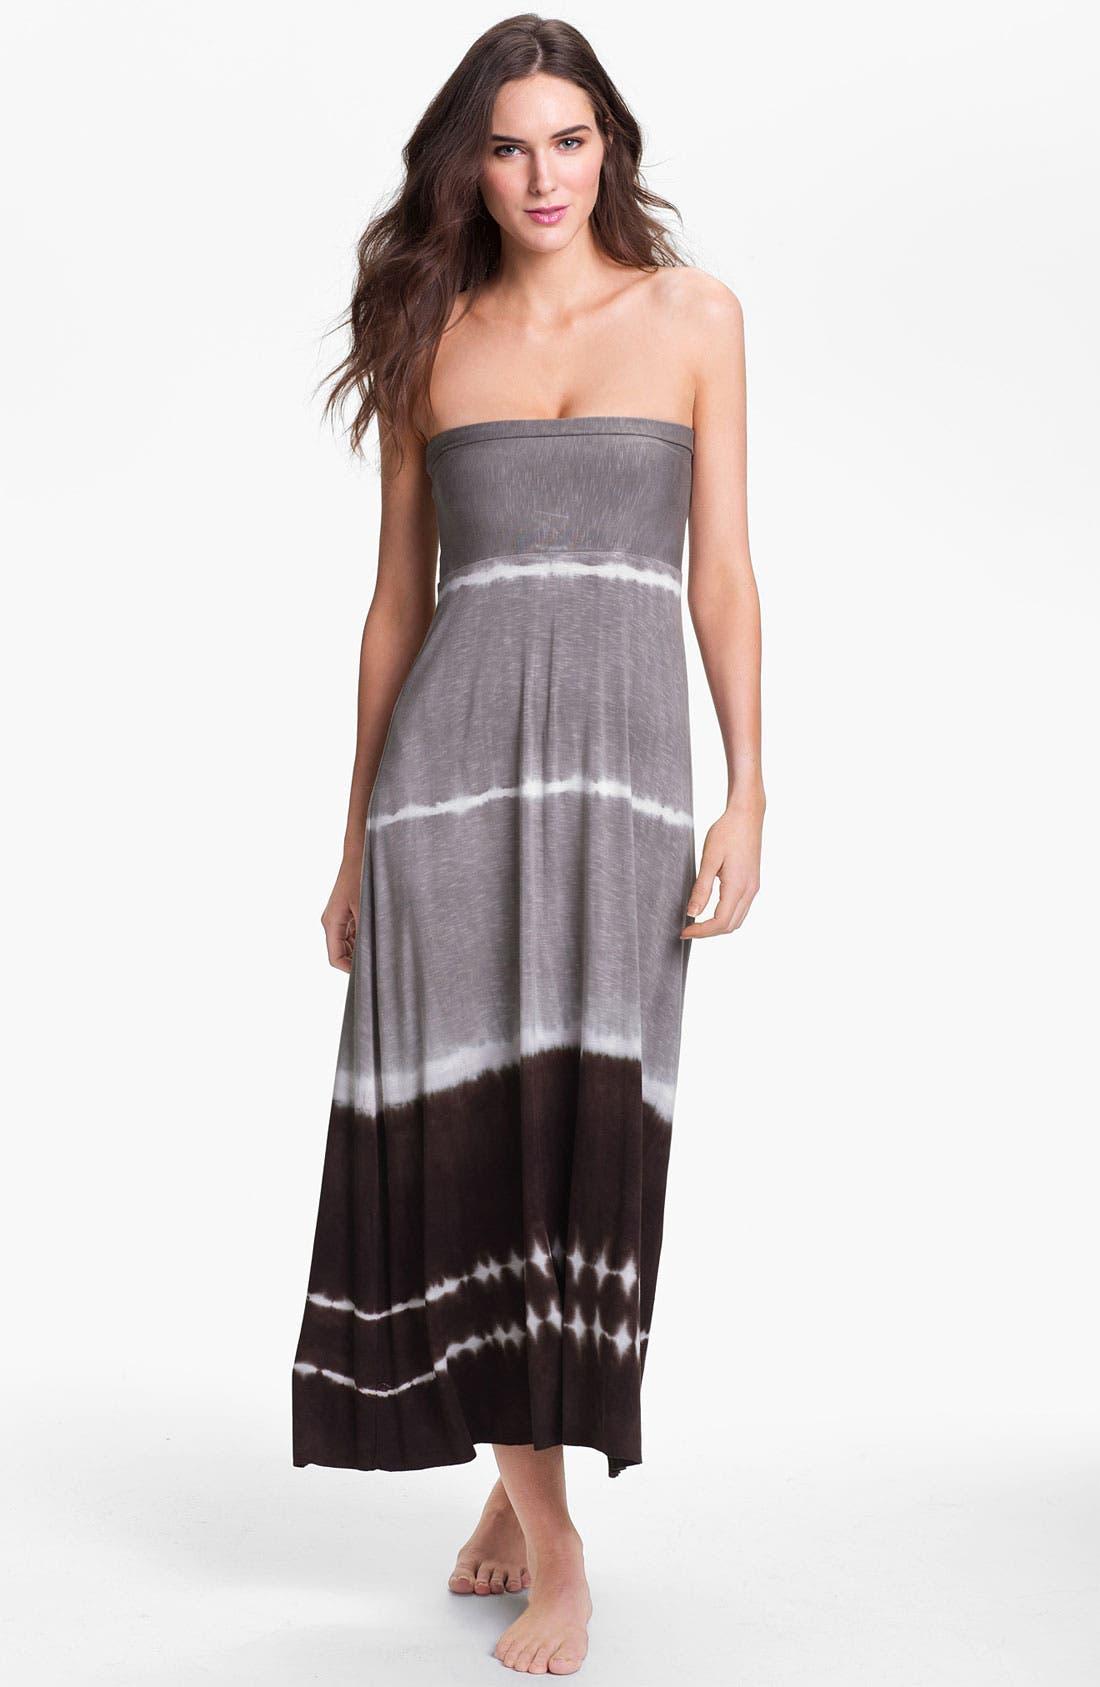 Alternate Image 1 Selected - Lucky Brand Swimwear 'Summer Lovin' Convertible Cover-Up Dress